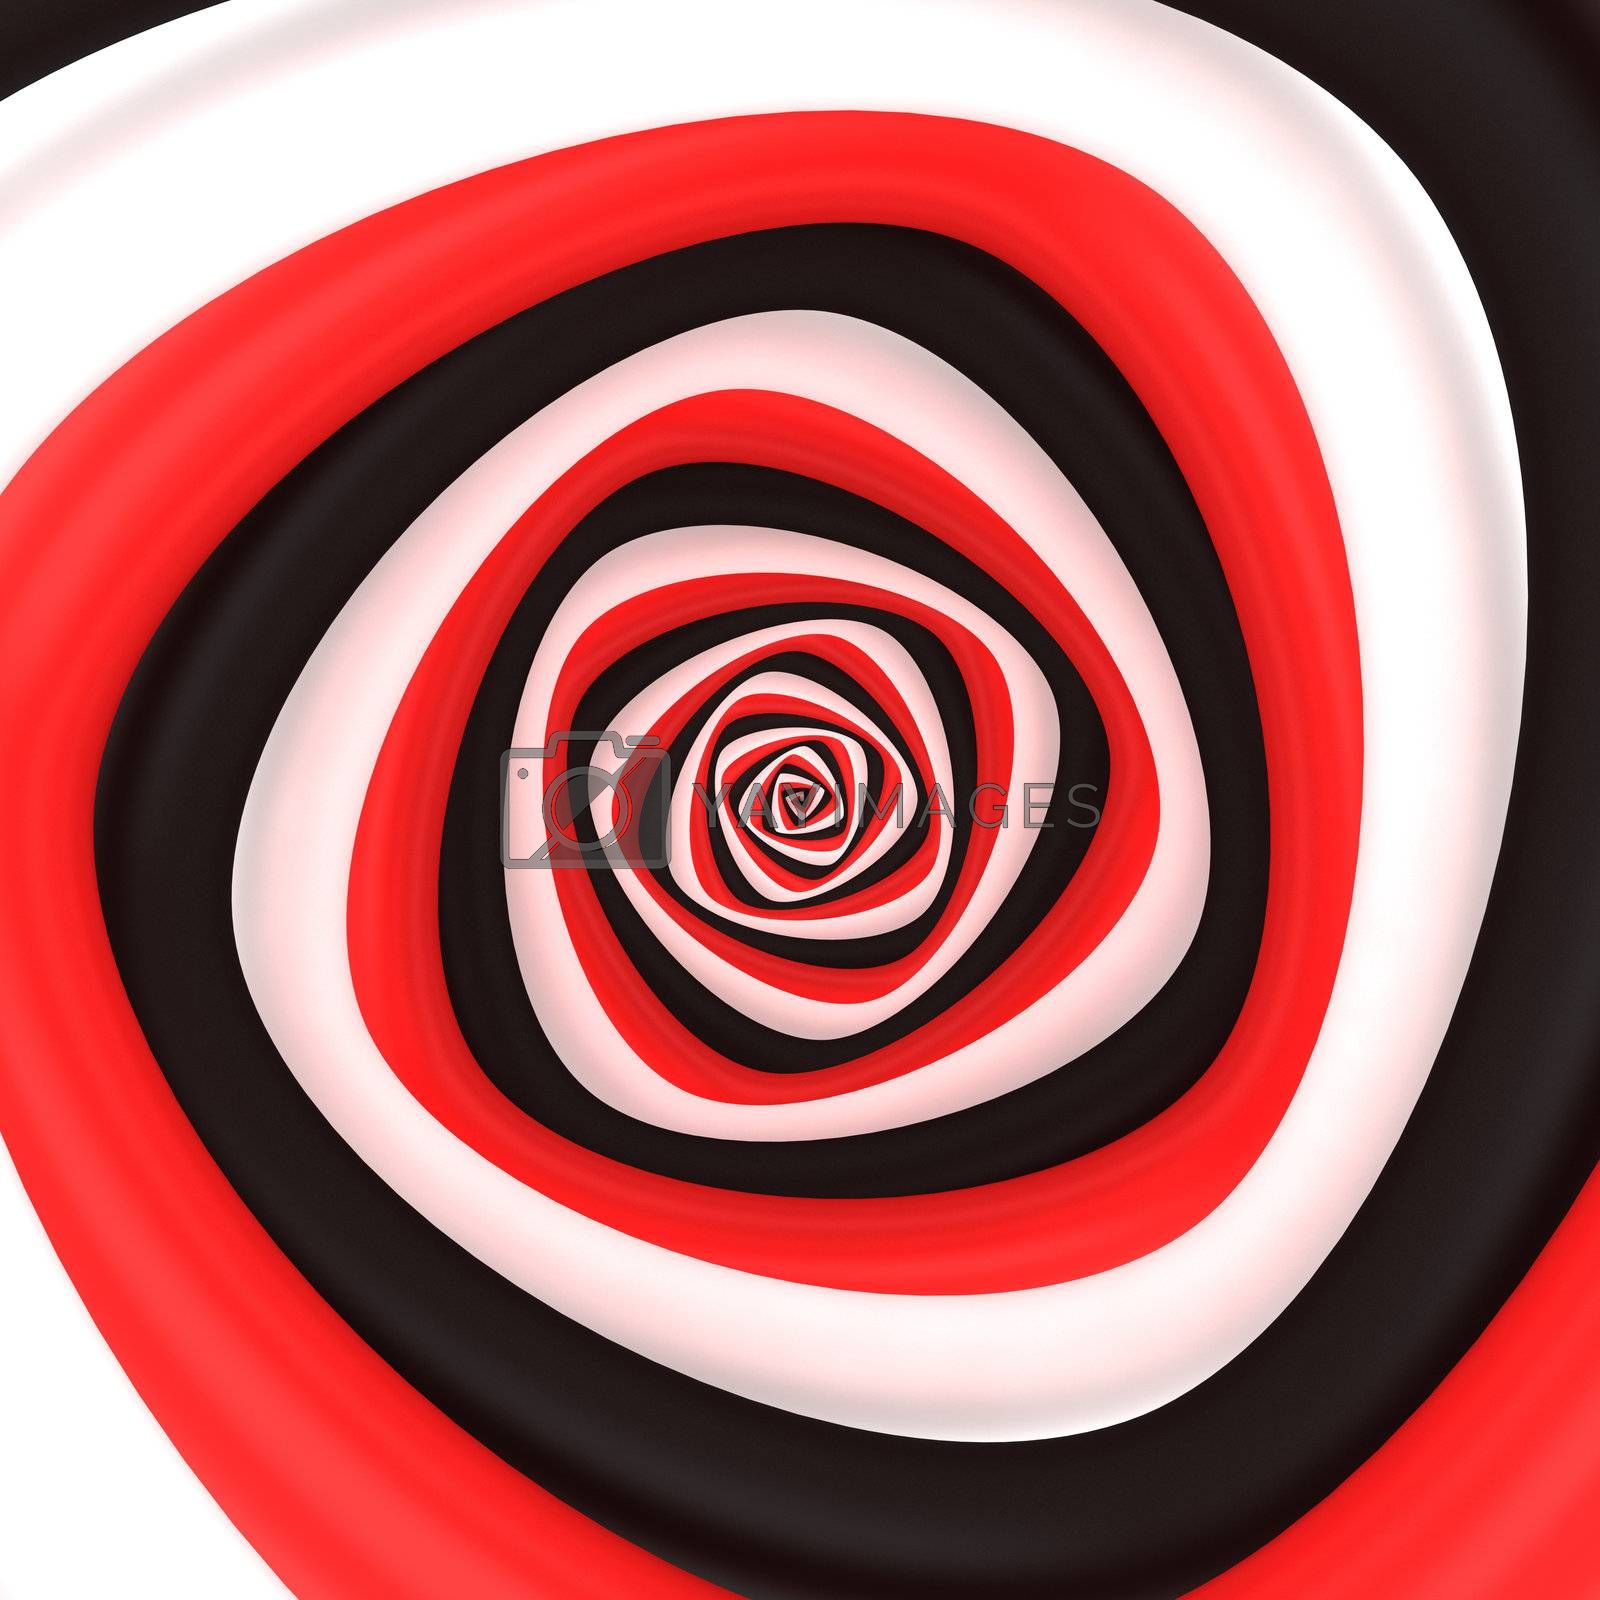 Triangular vortex of black, white, red colors